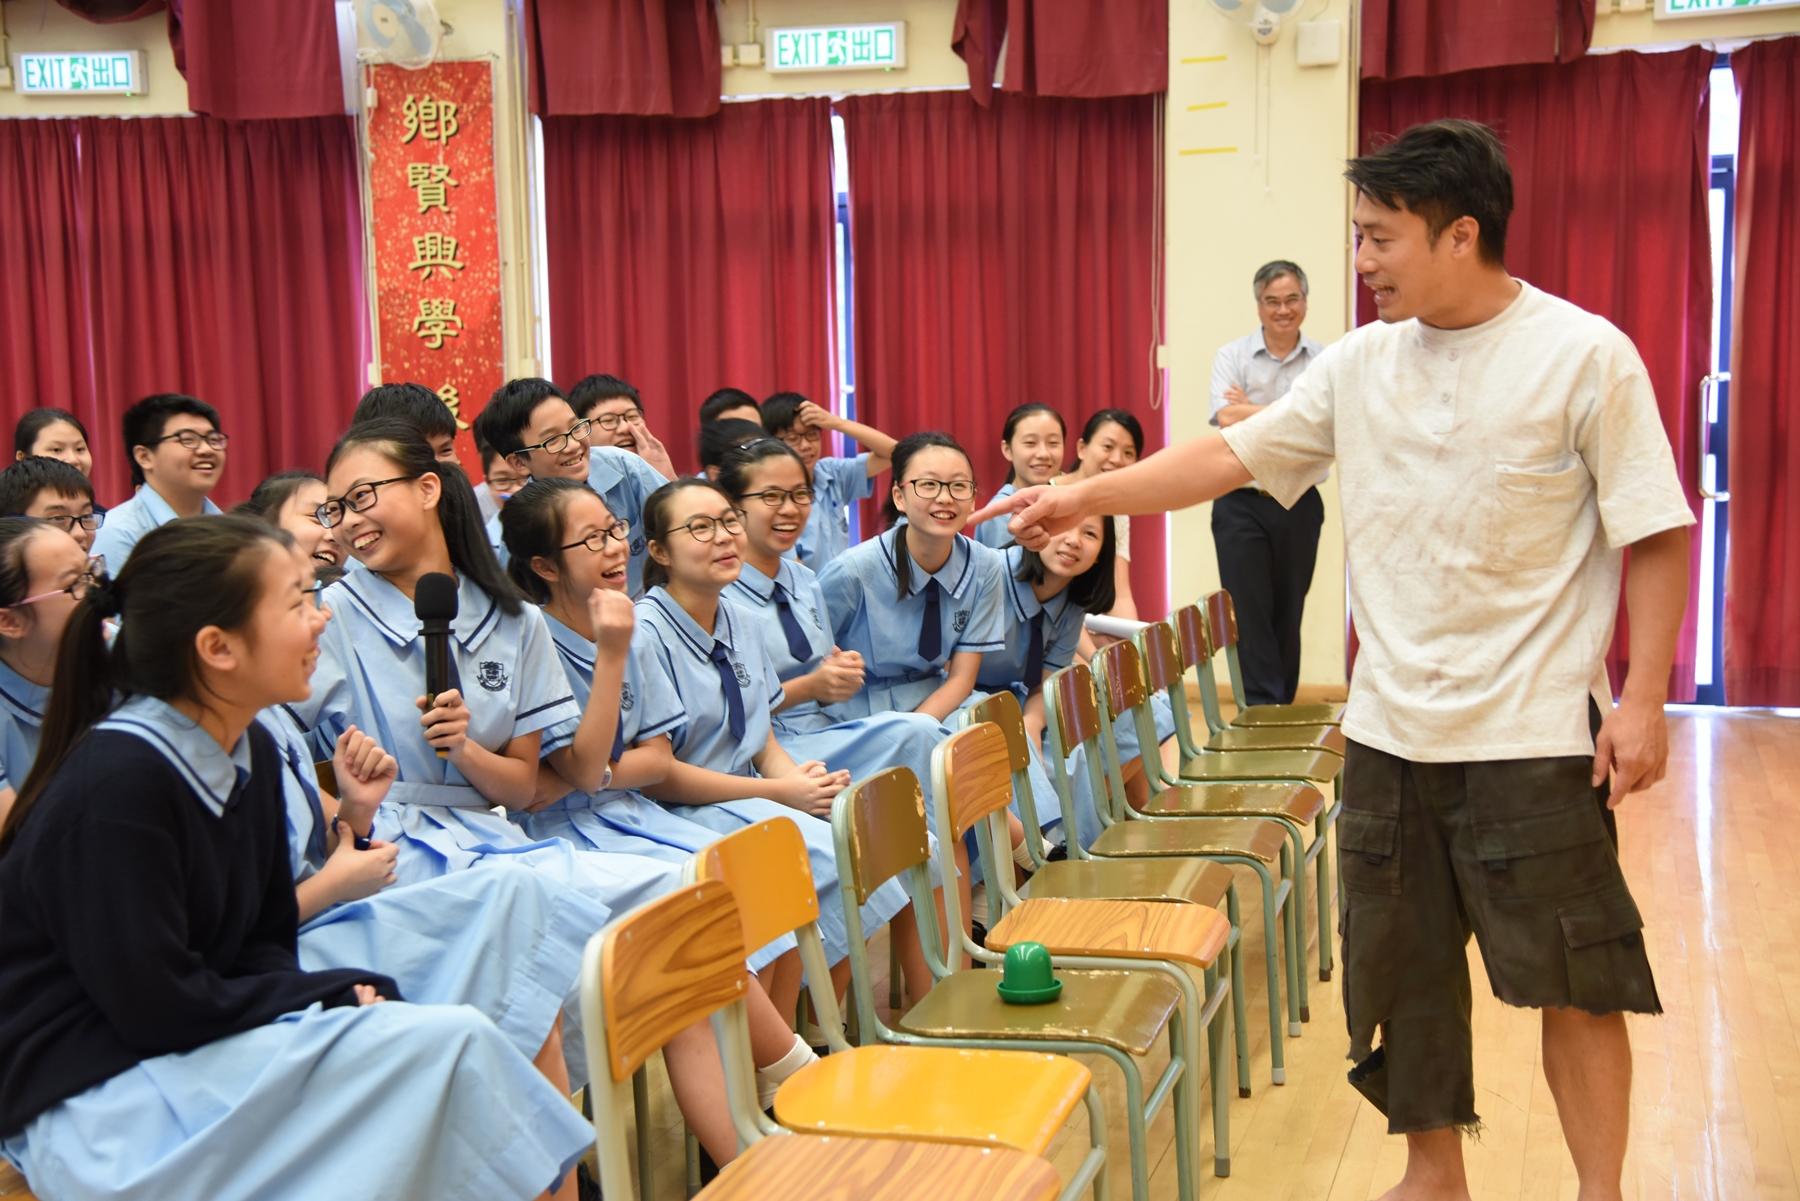 http://npc.edu.hk/sites/default/files/dsc_1665.jpg